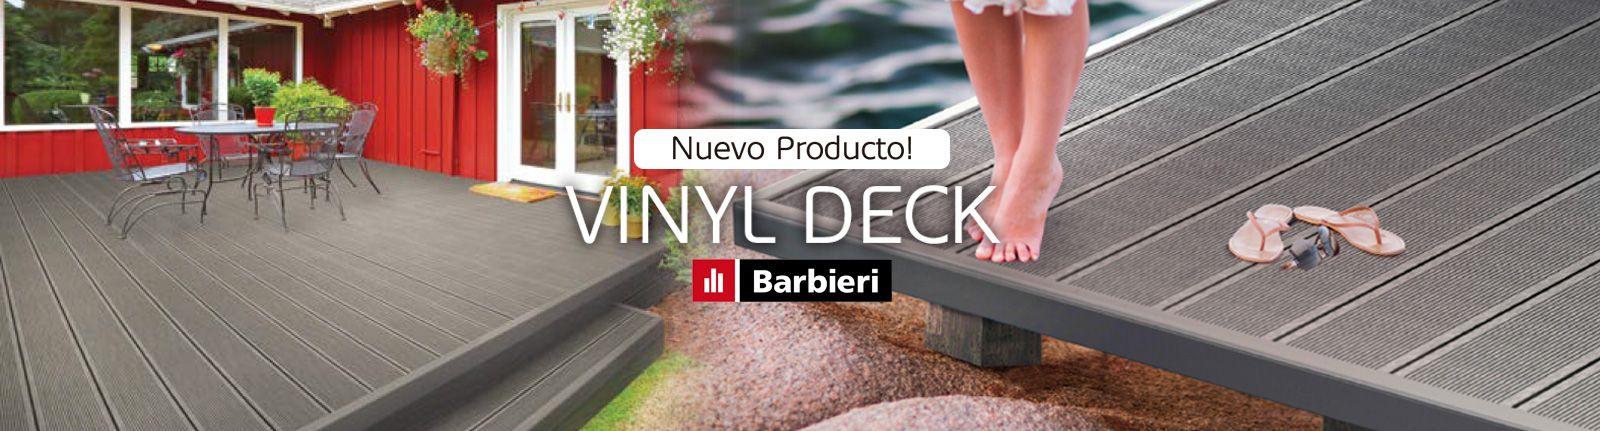 Vinyl-Deck